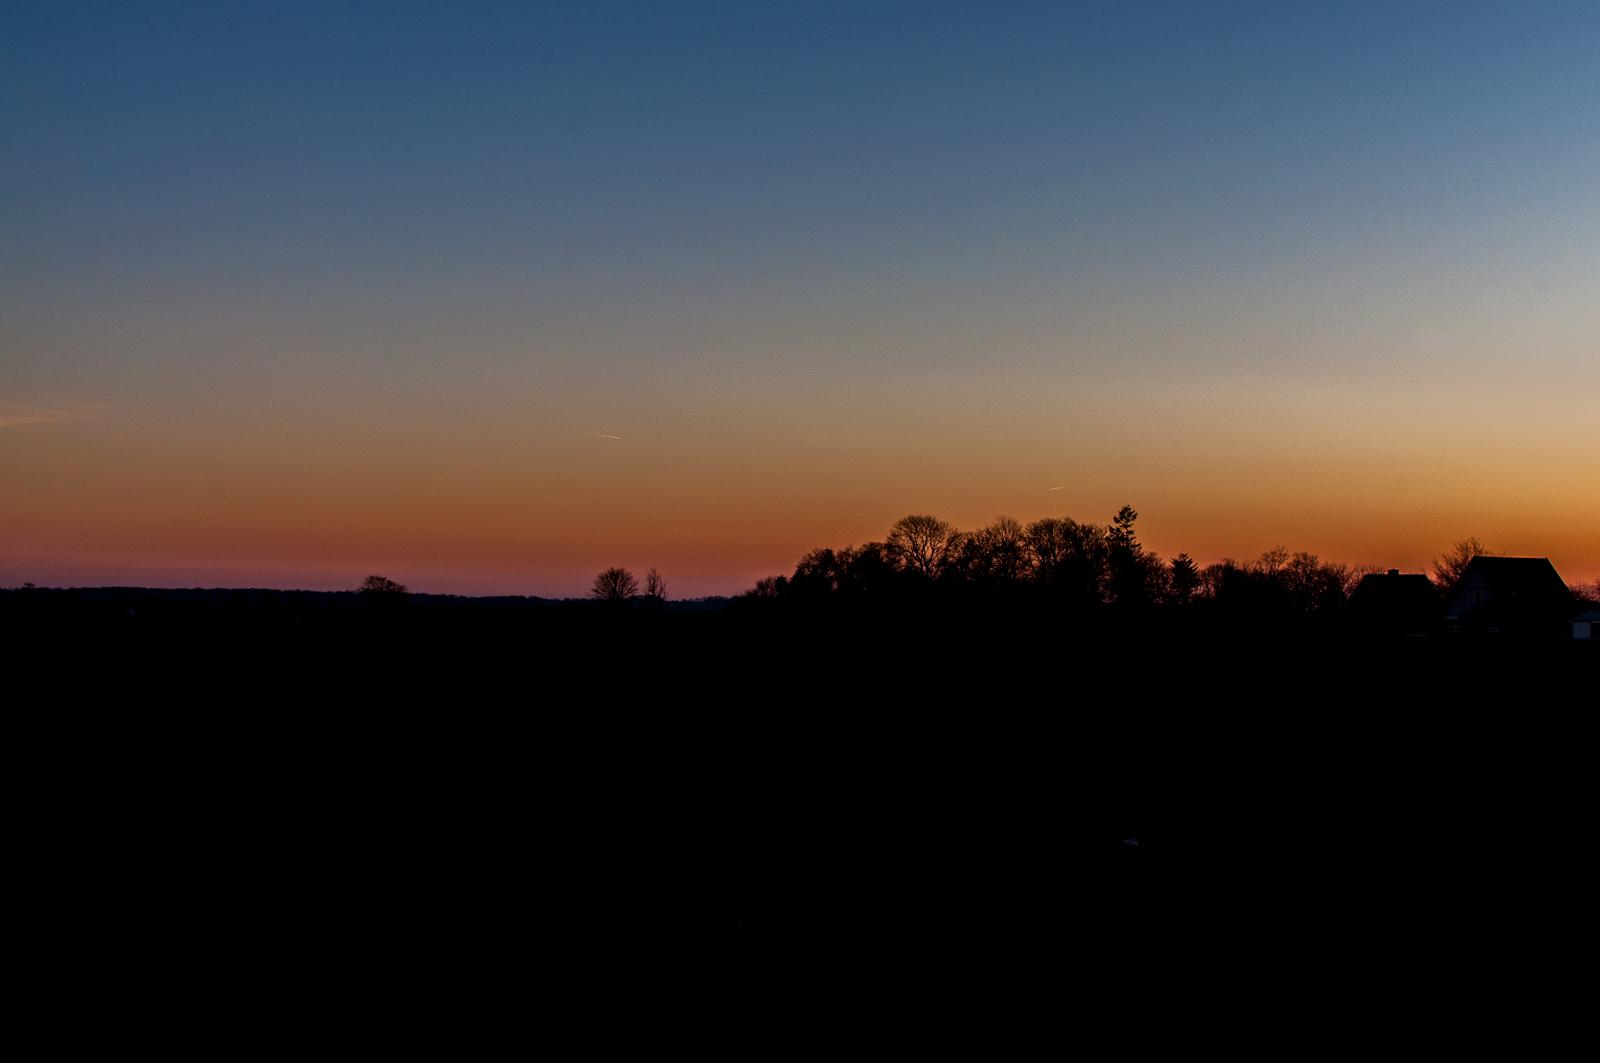 Solnedgang over Askov